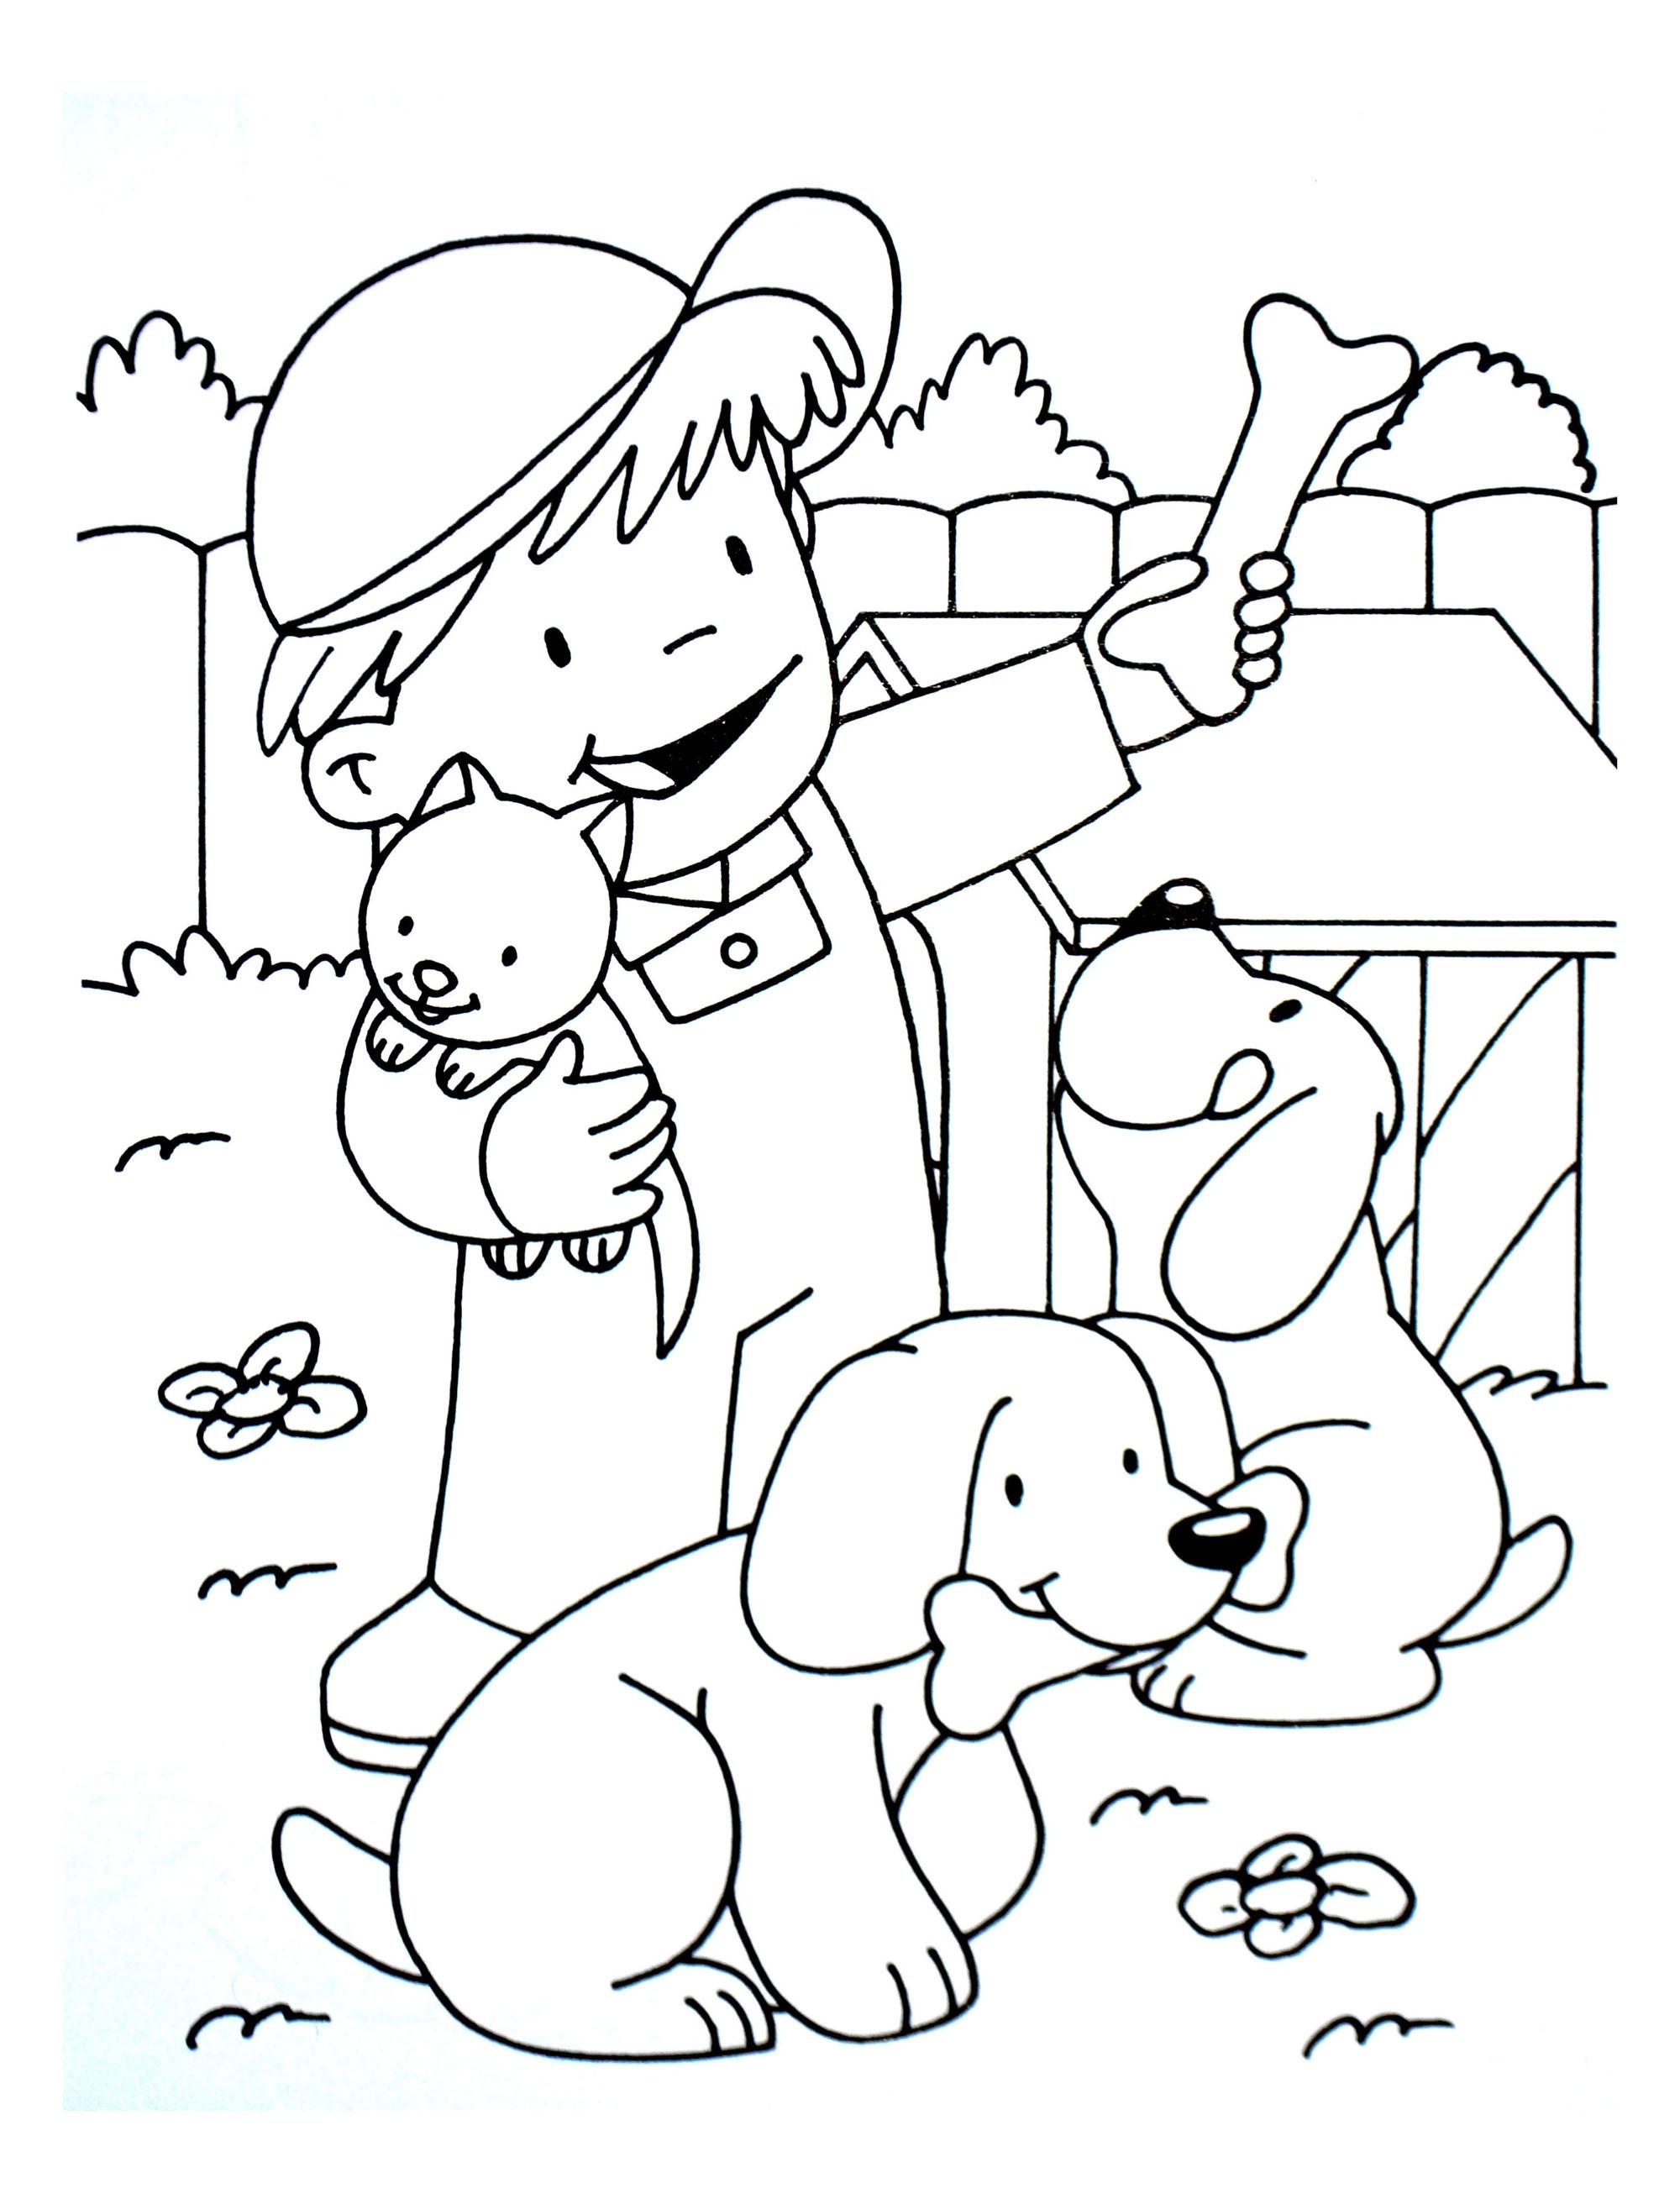 Farm to print - Farm Kids Coloring Pages